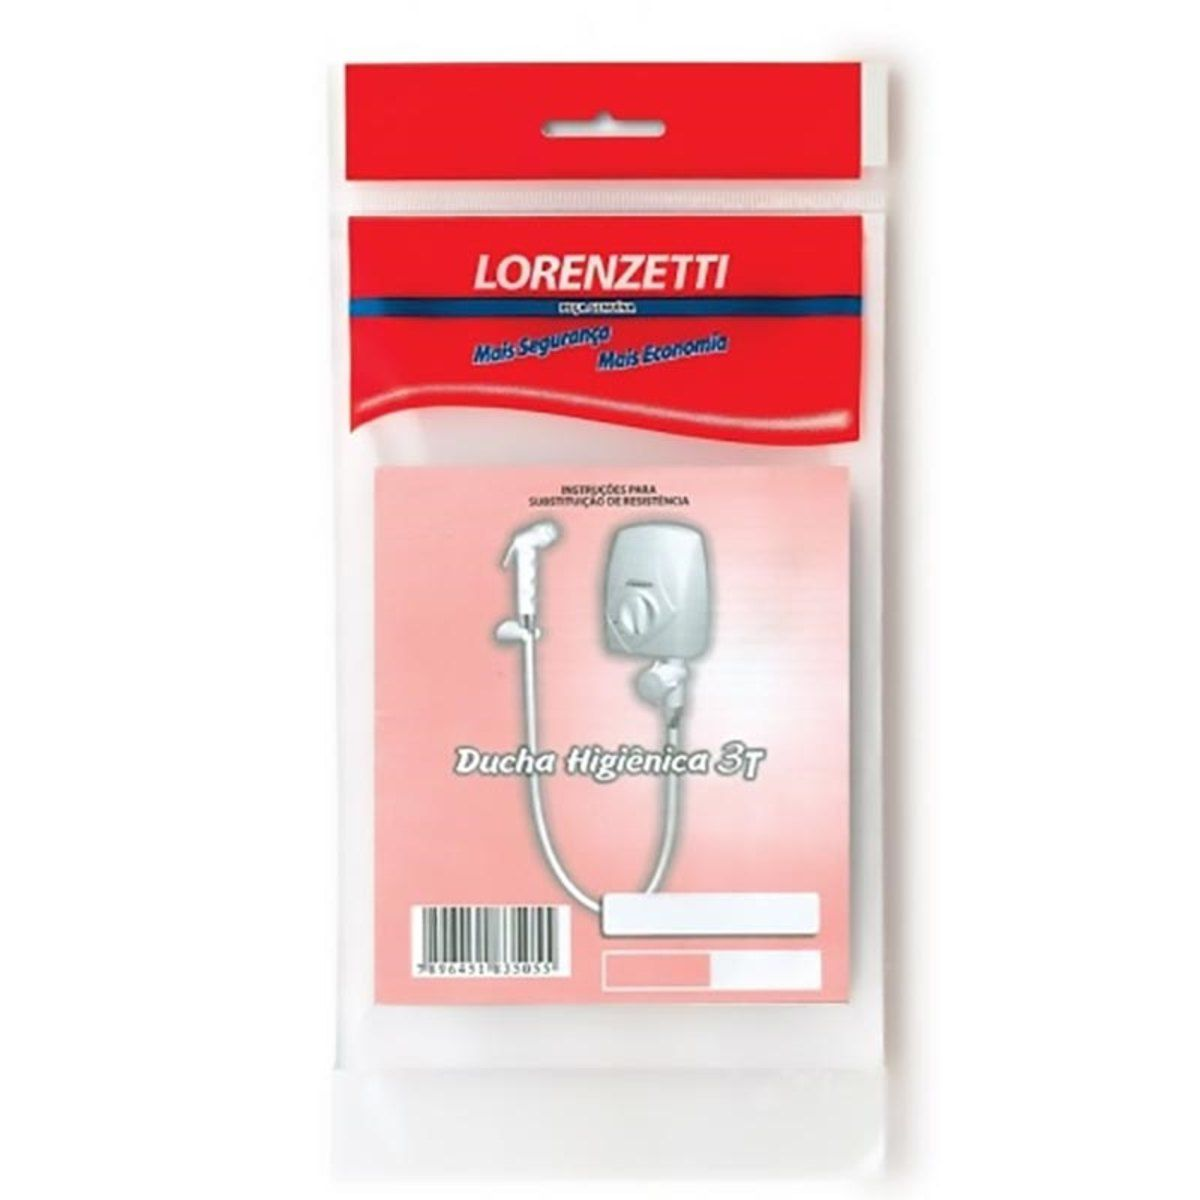 Resistência Ducha Higiênica 3T 4300W 220V 400E Lorenzetti